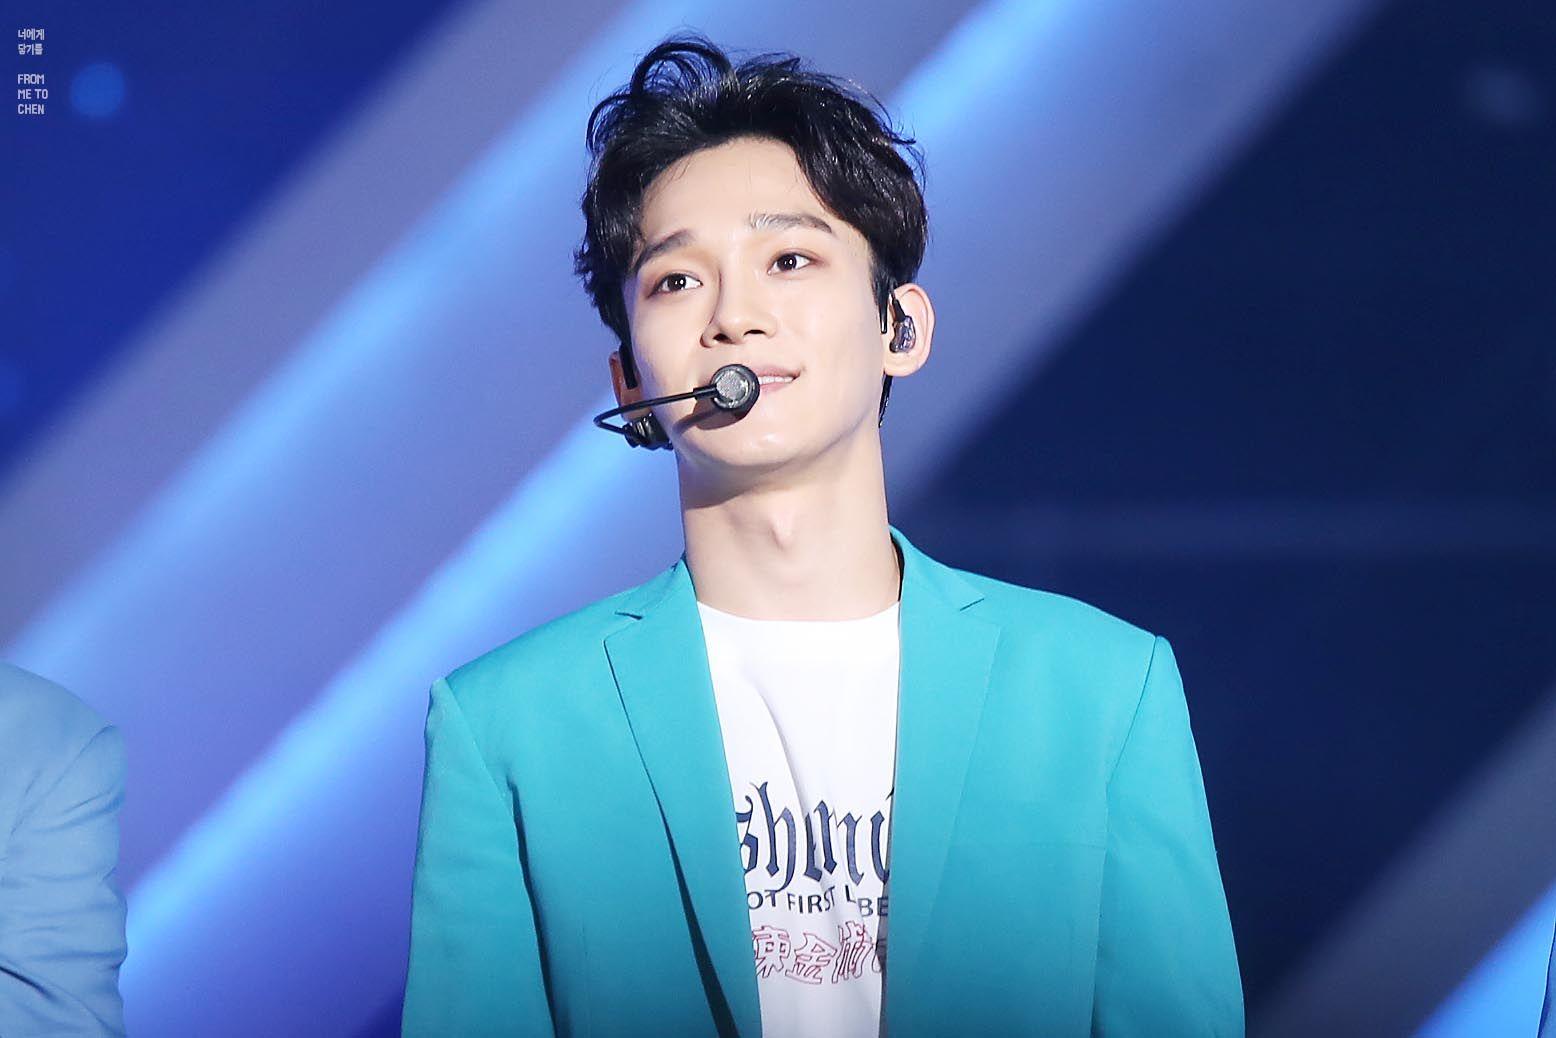 160604 #Chen #EXO